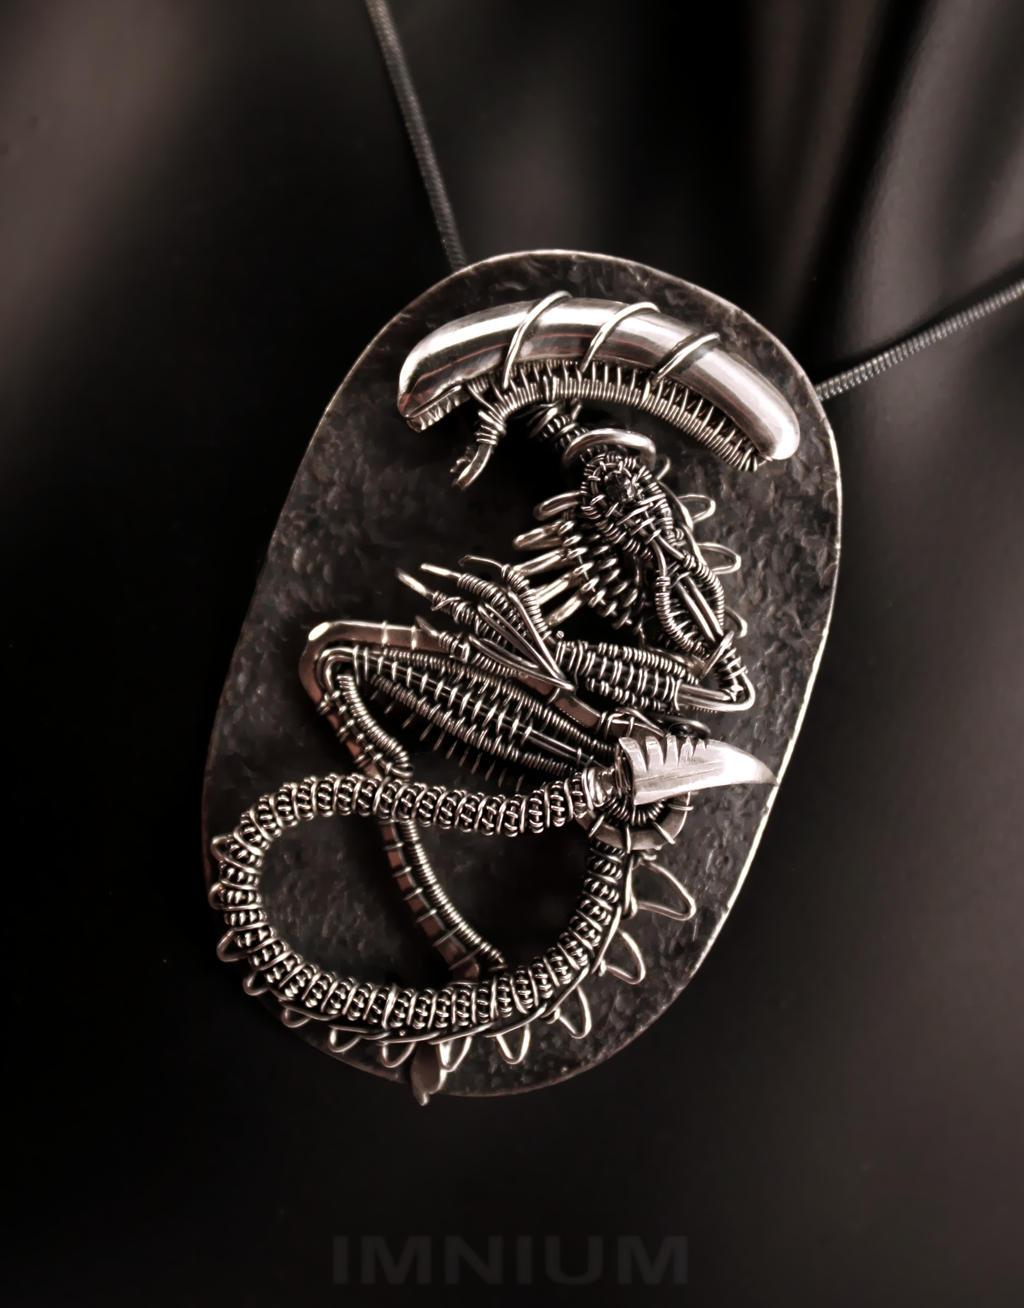 Alien fossil II by IMNIUM